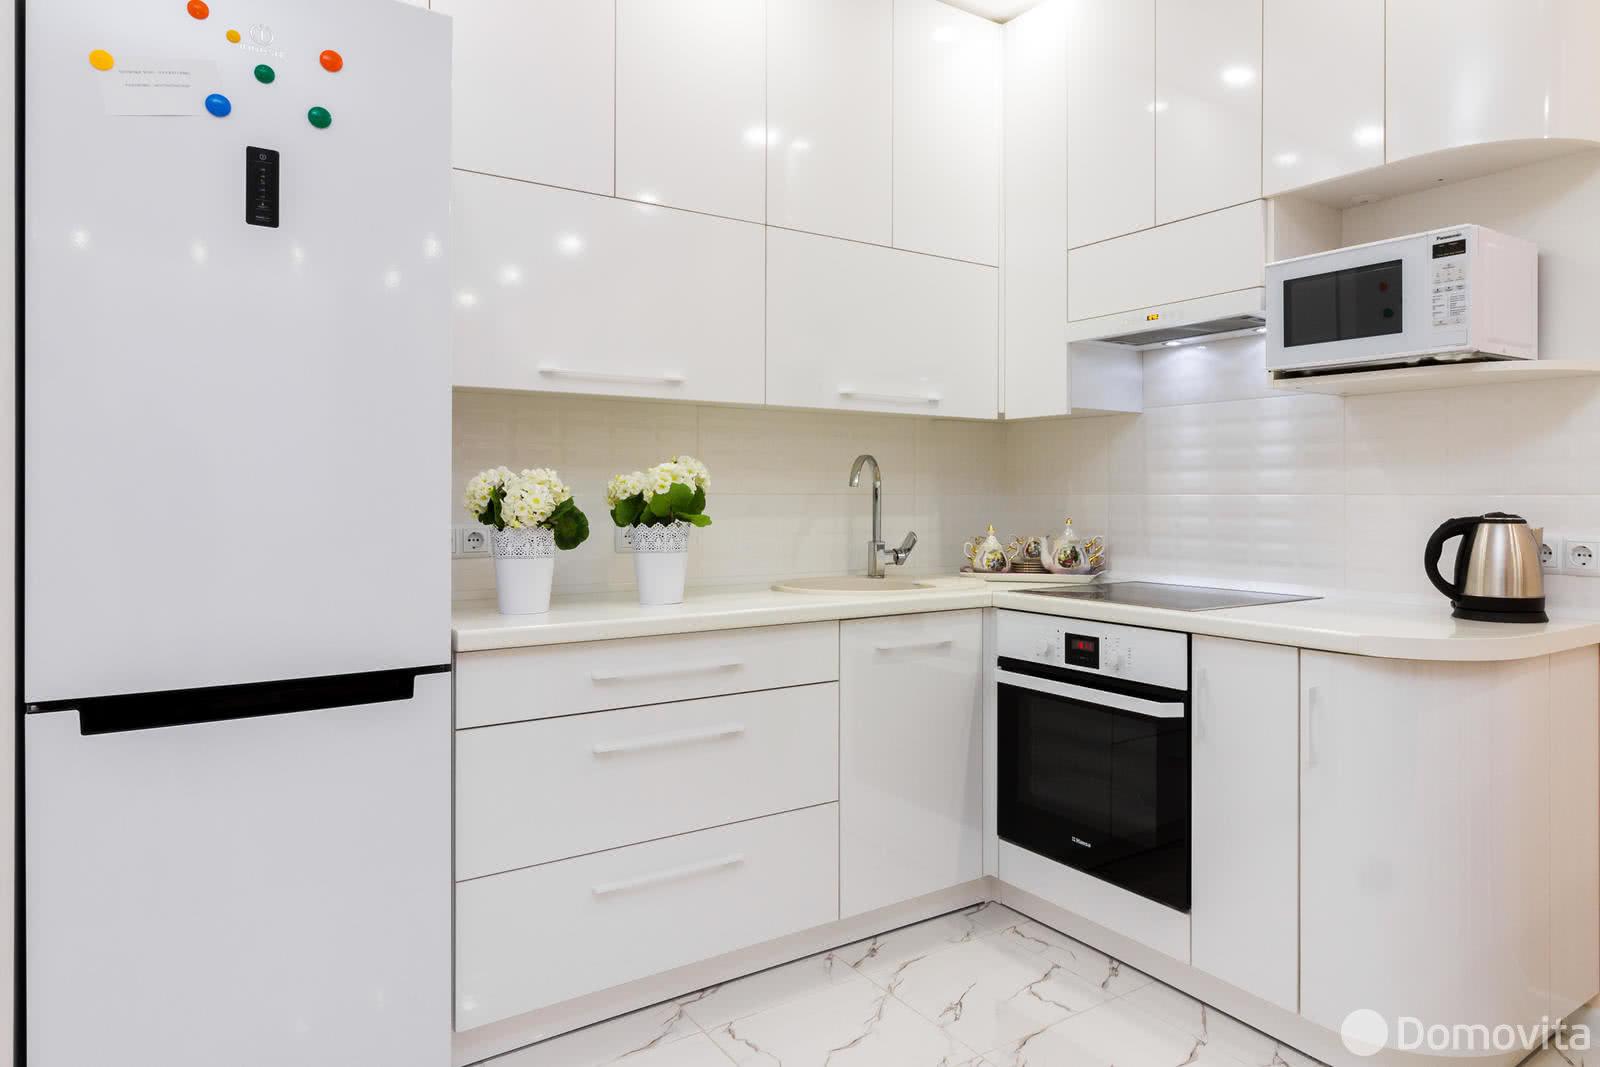 Аренда 2-комнатной квартиры на сутки в Минске, ул. Репина, д. 4 - фото 4